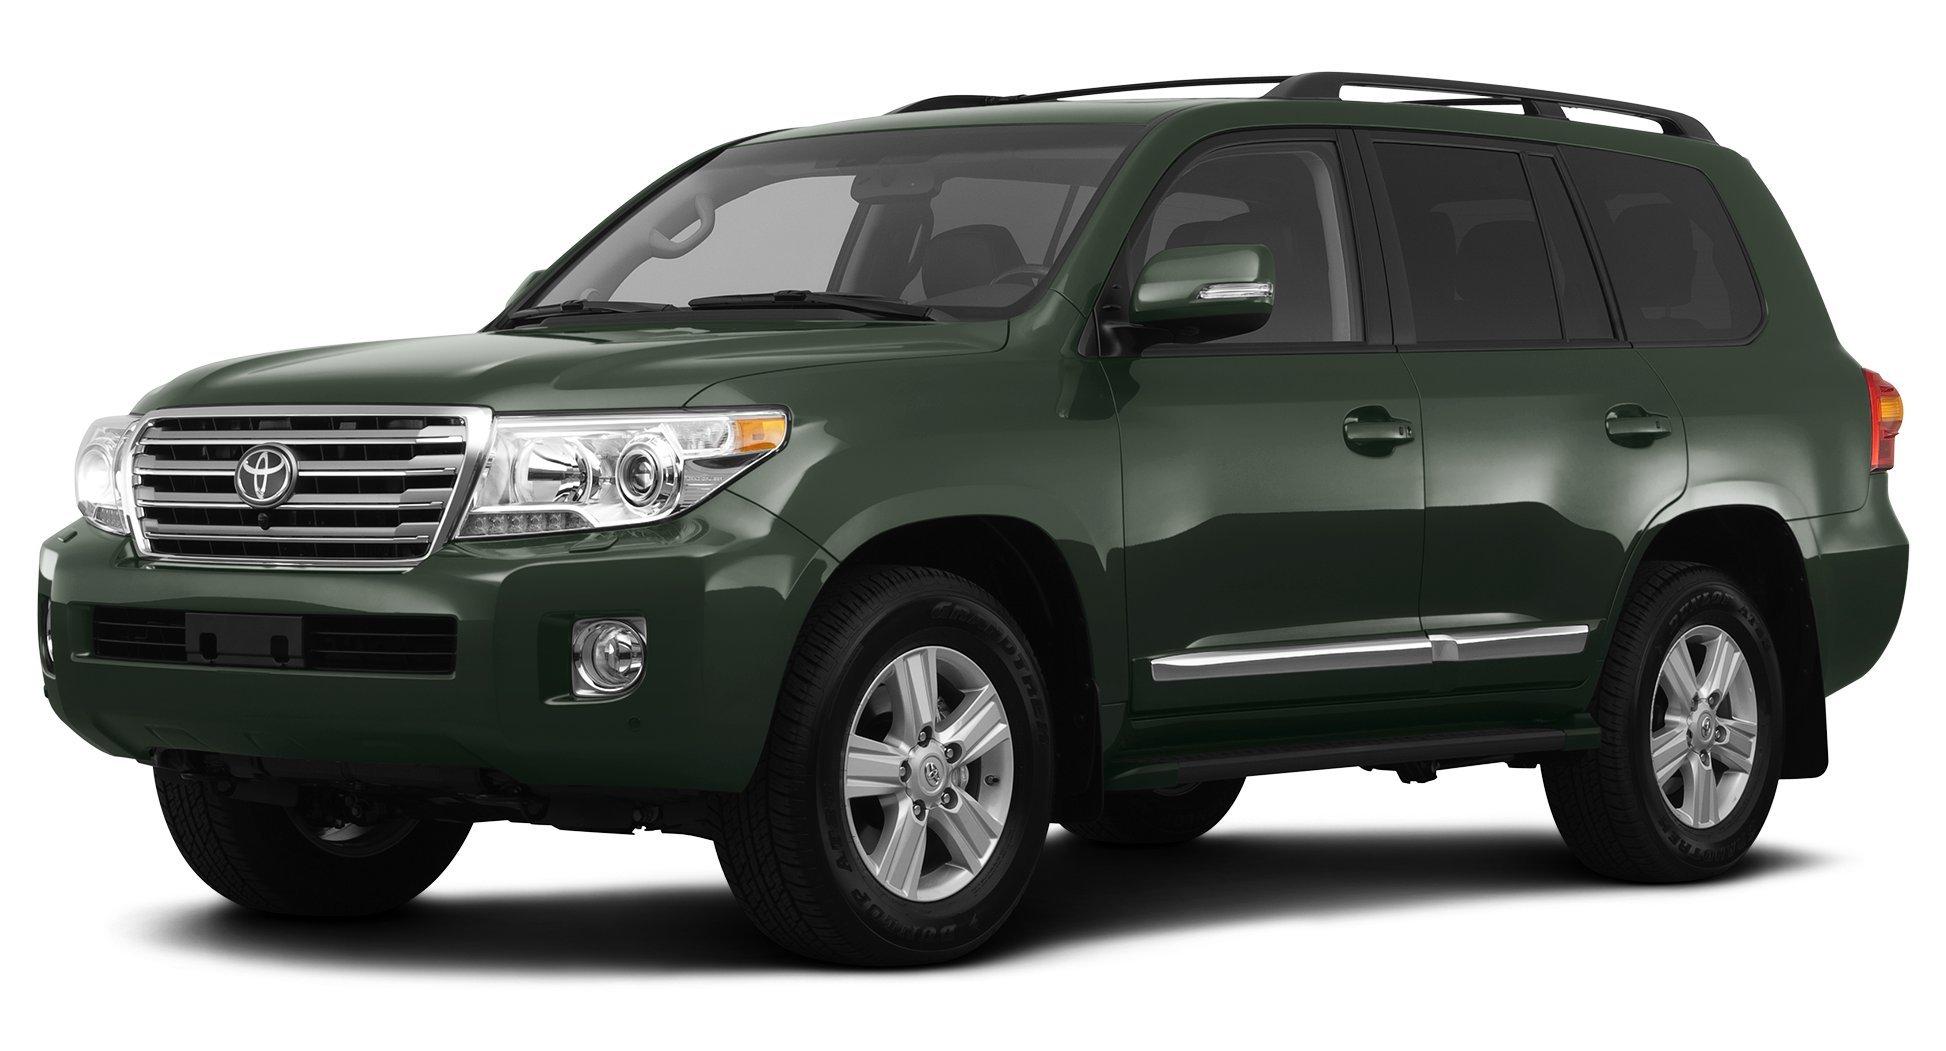 2013 Toyota Land Cruiser, 4-Door 4-Wheel Drive (GS) ...